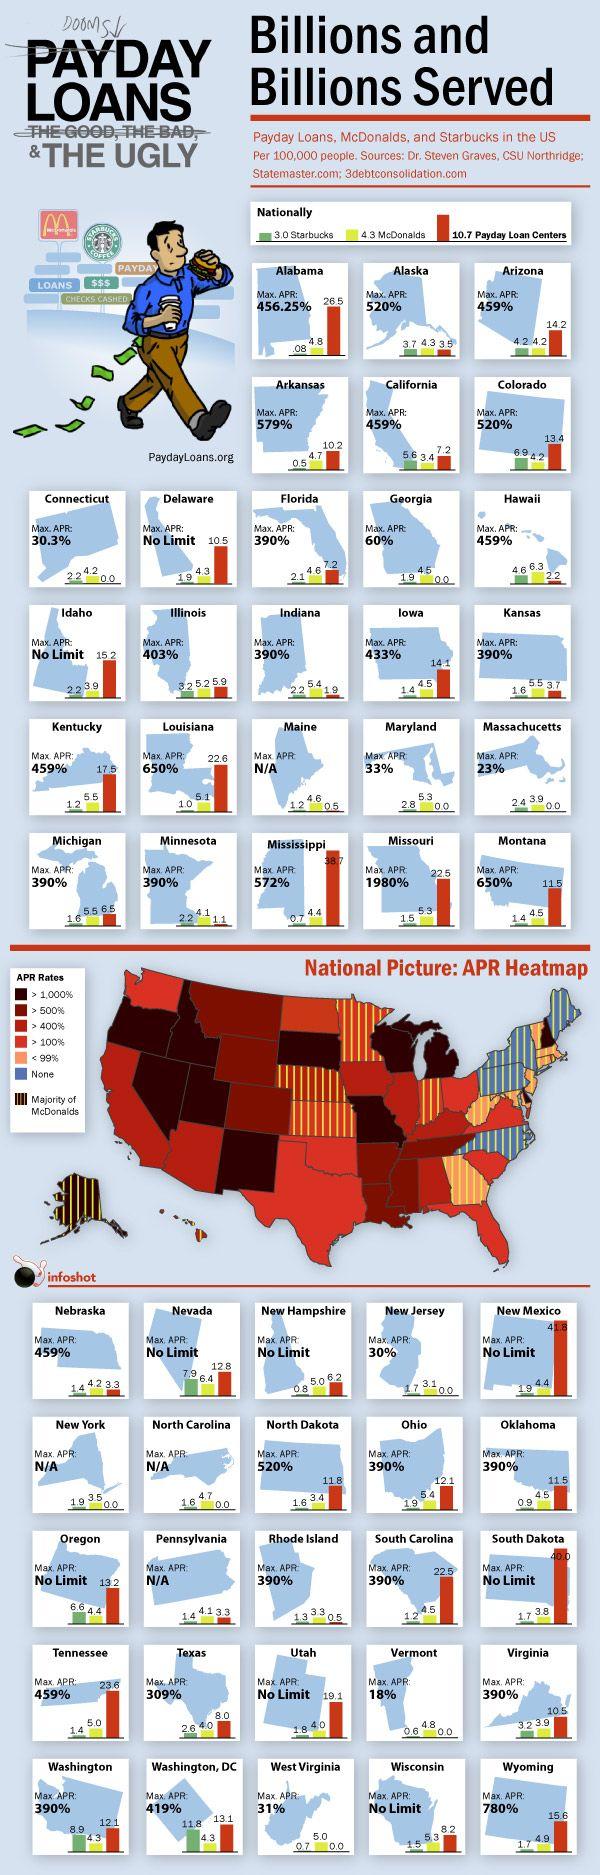 Colorado payday loan legislation photo 10